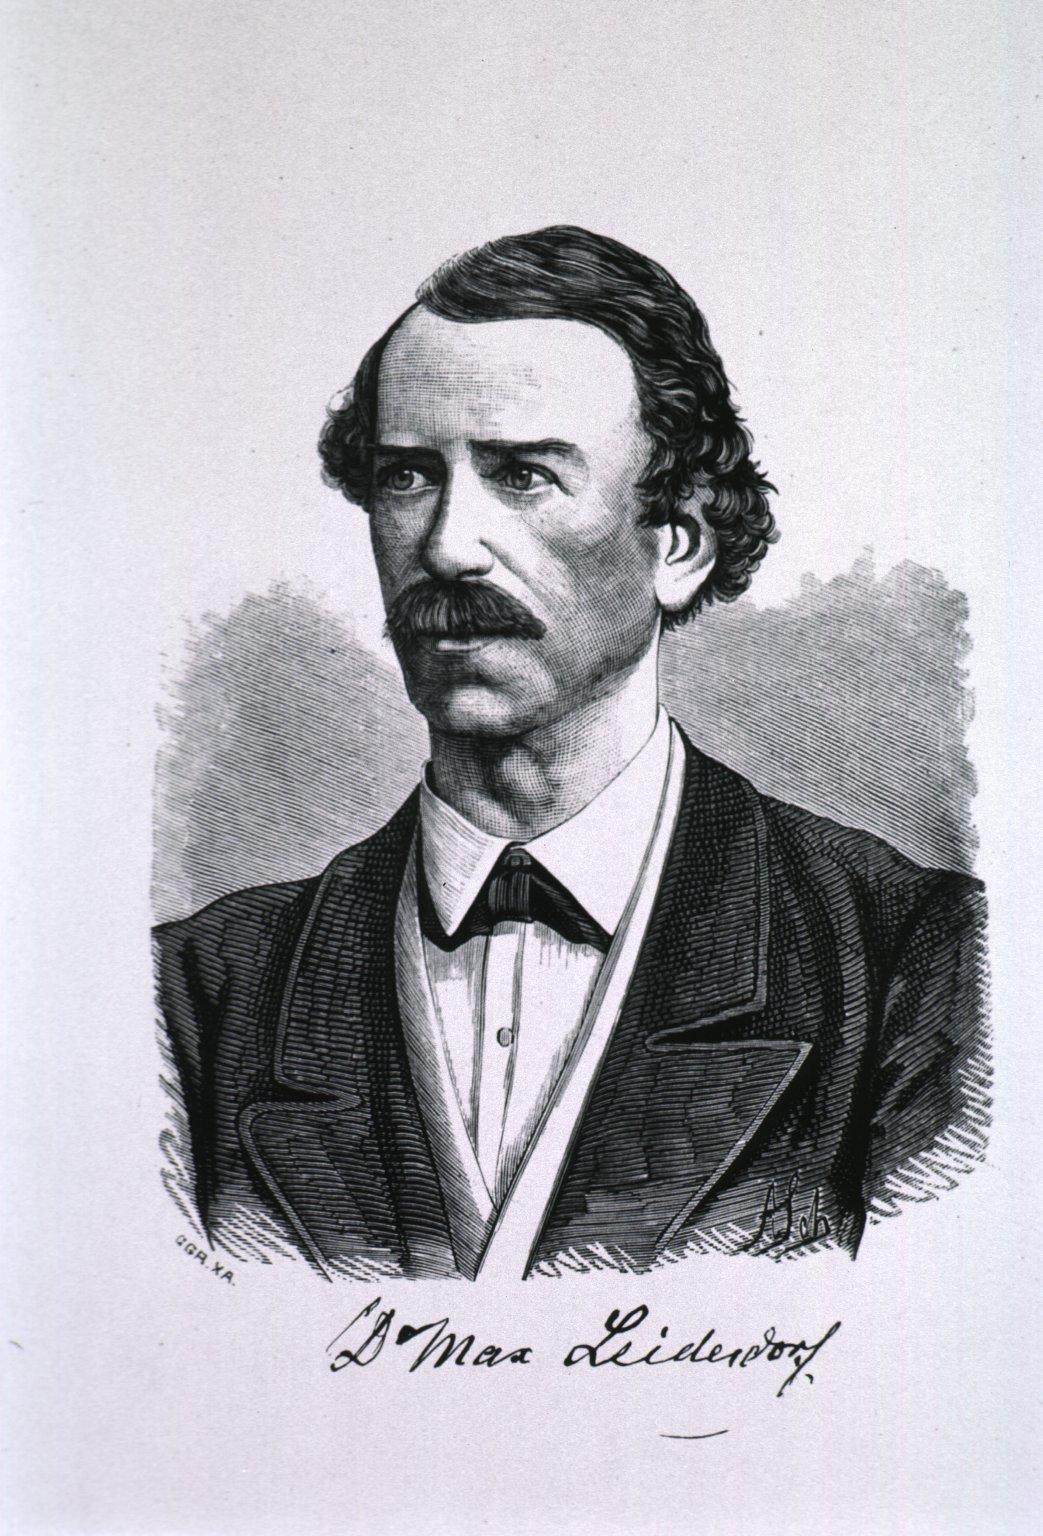 Maximilian Leidesdorf (1818-1889)